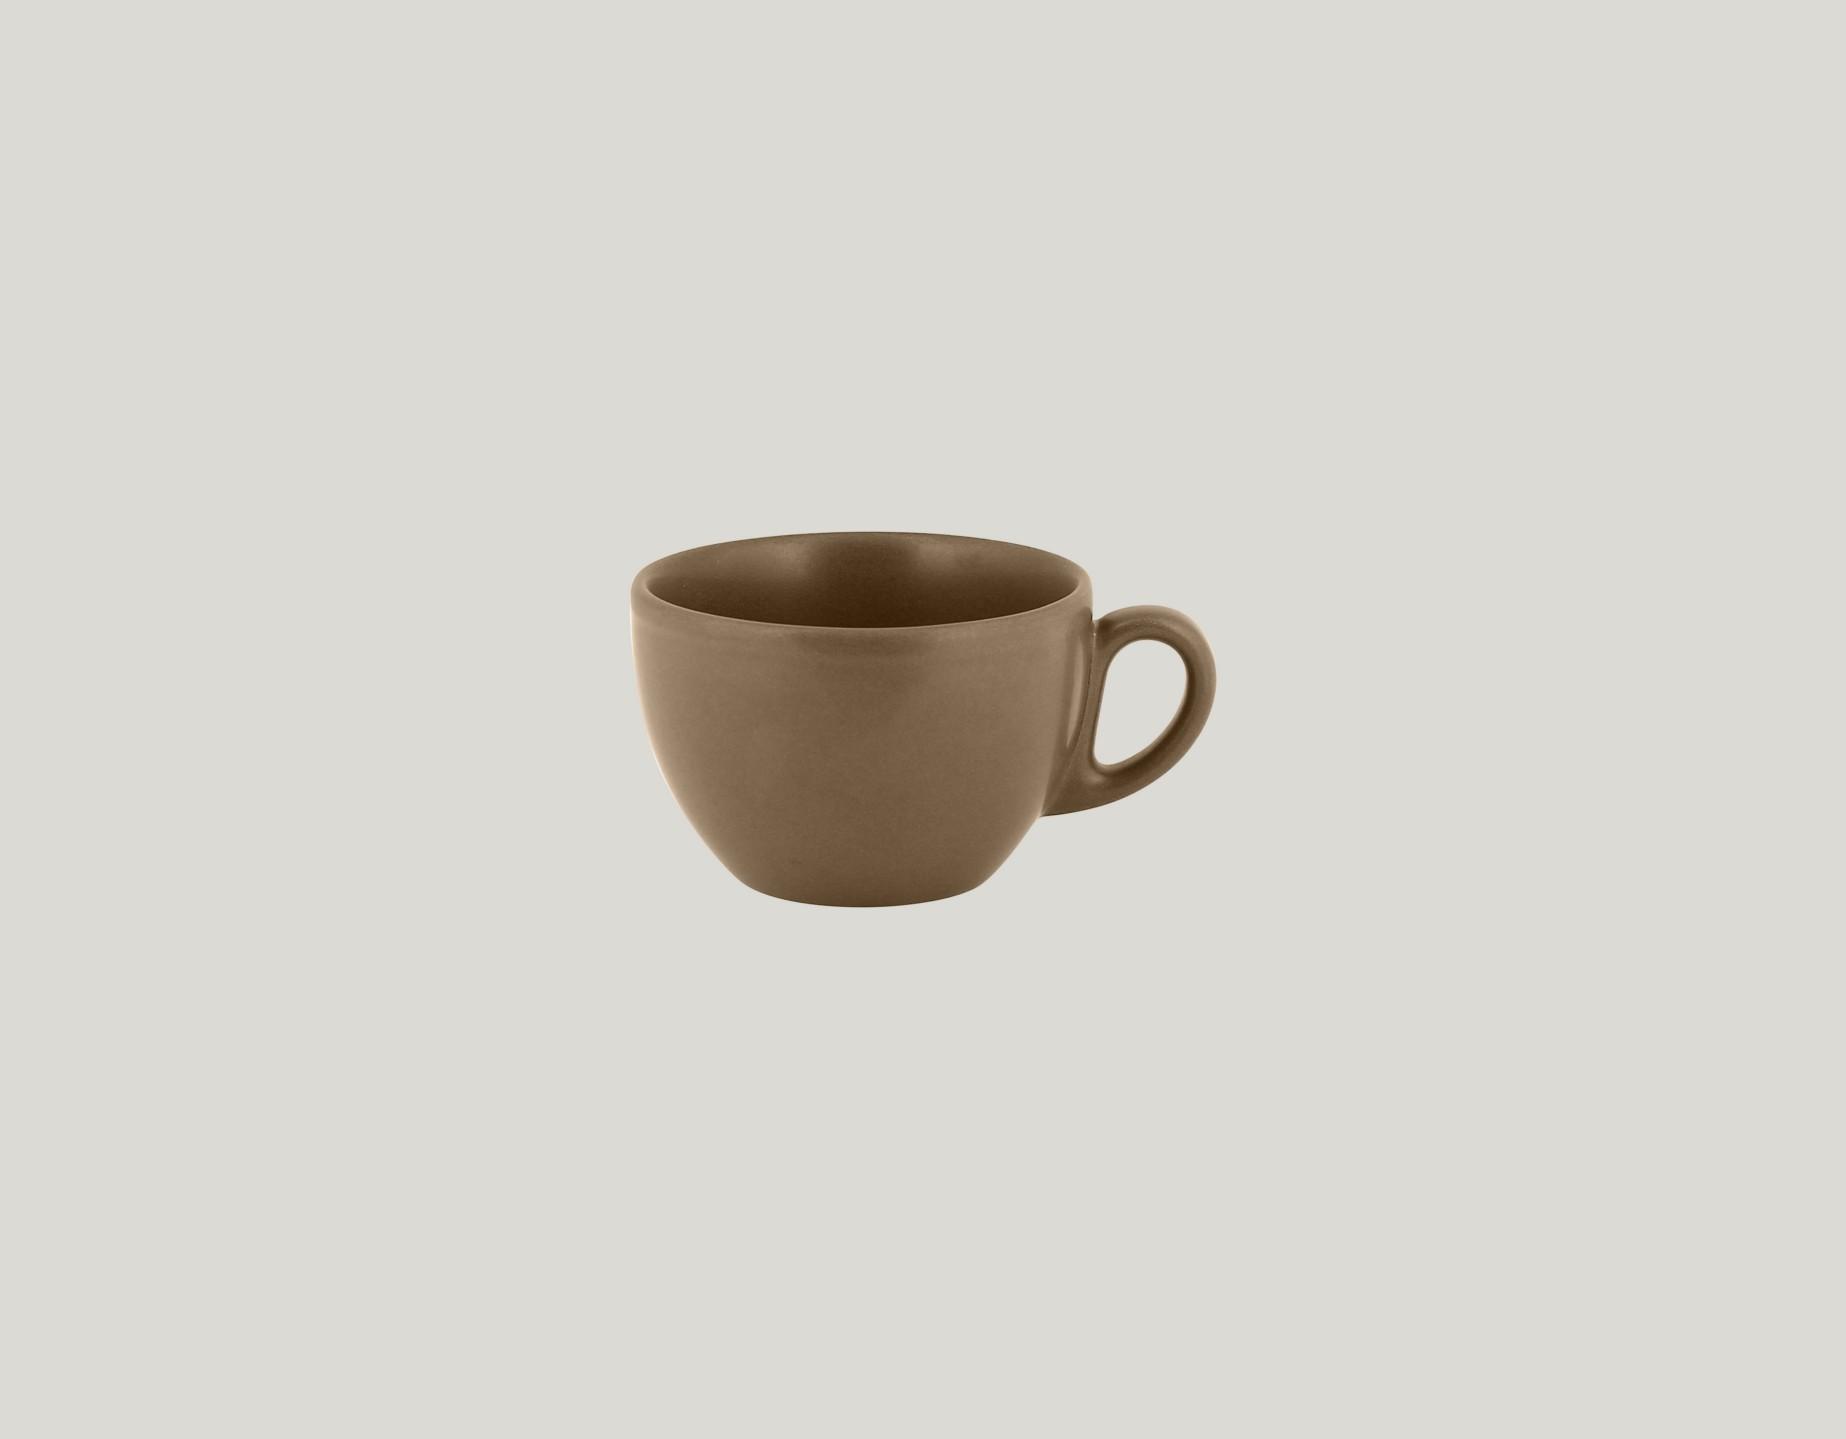 Šálek na kávu 23 cl - crust